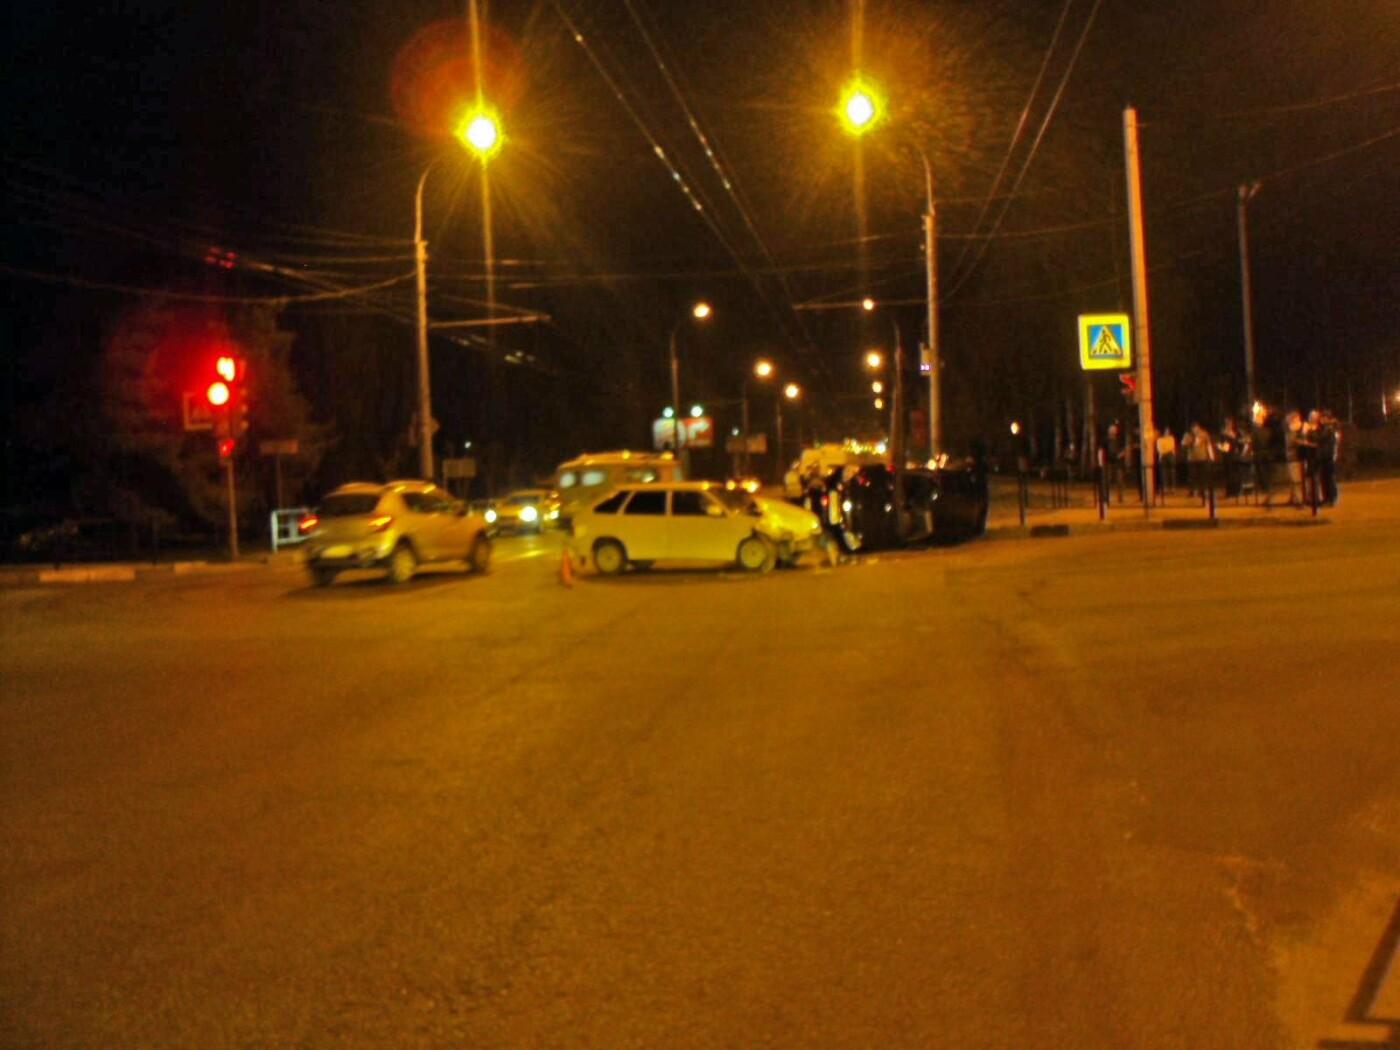 В Тамбове на улице Карла Маркса при столкновении двух легковушек пострадал человек, фото-3